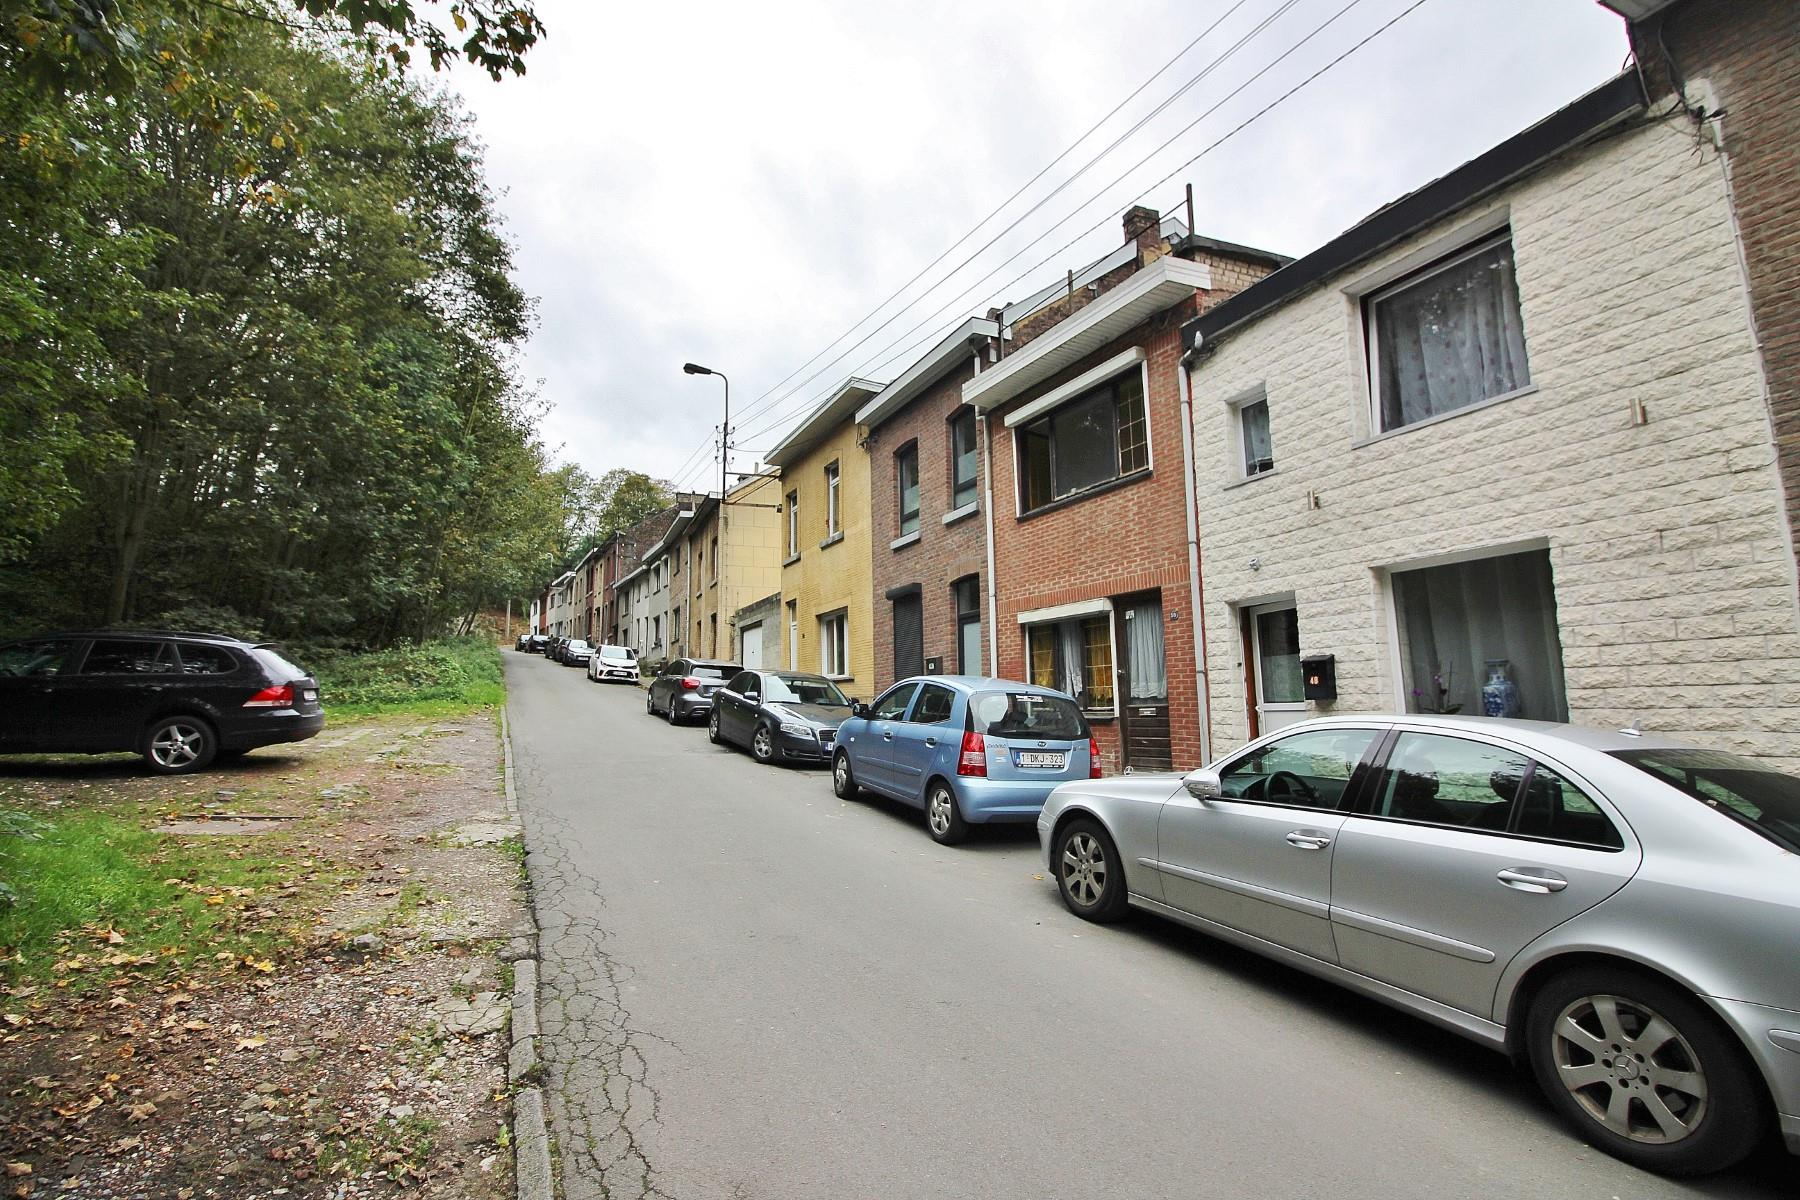 Maison - Seraing Jemeppesur-Meuse - #3879549-16